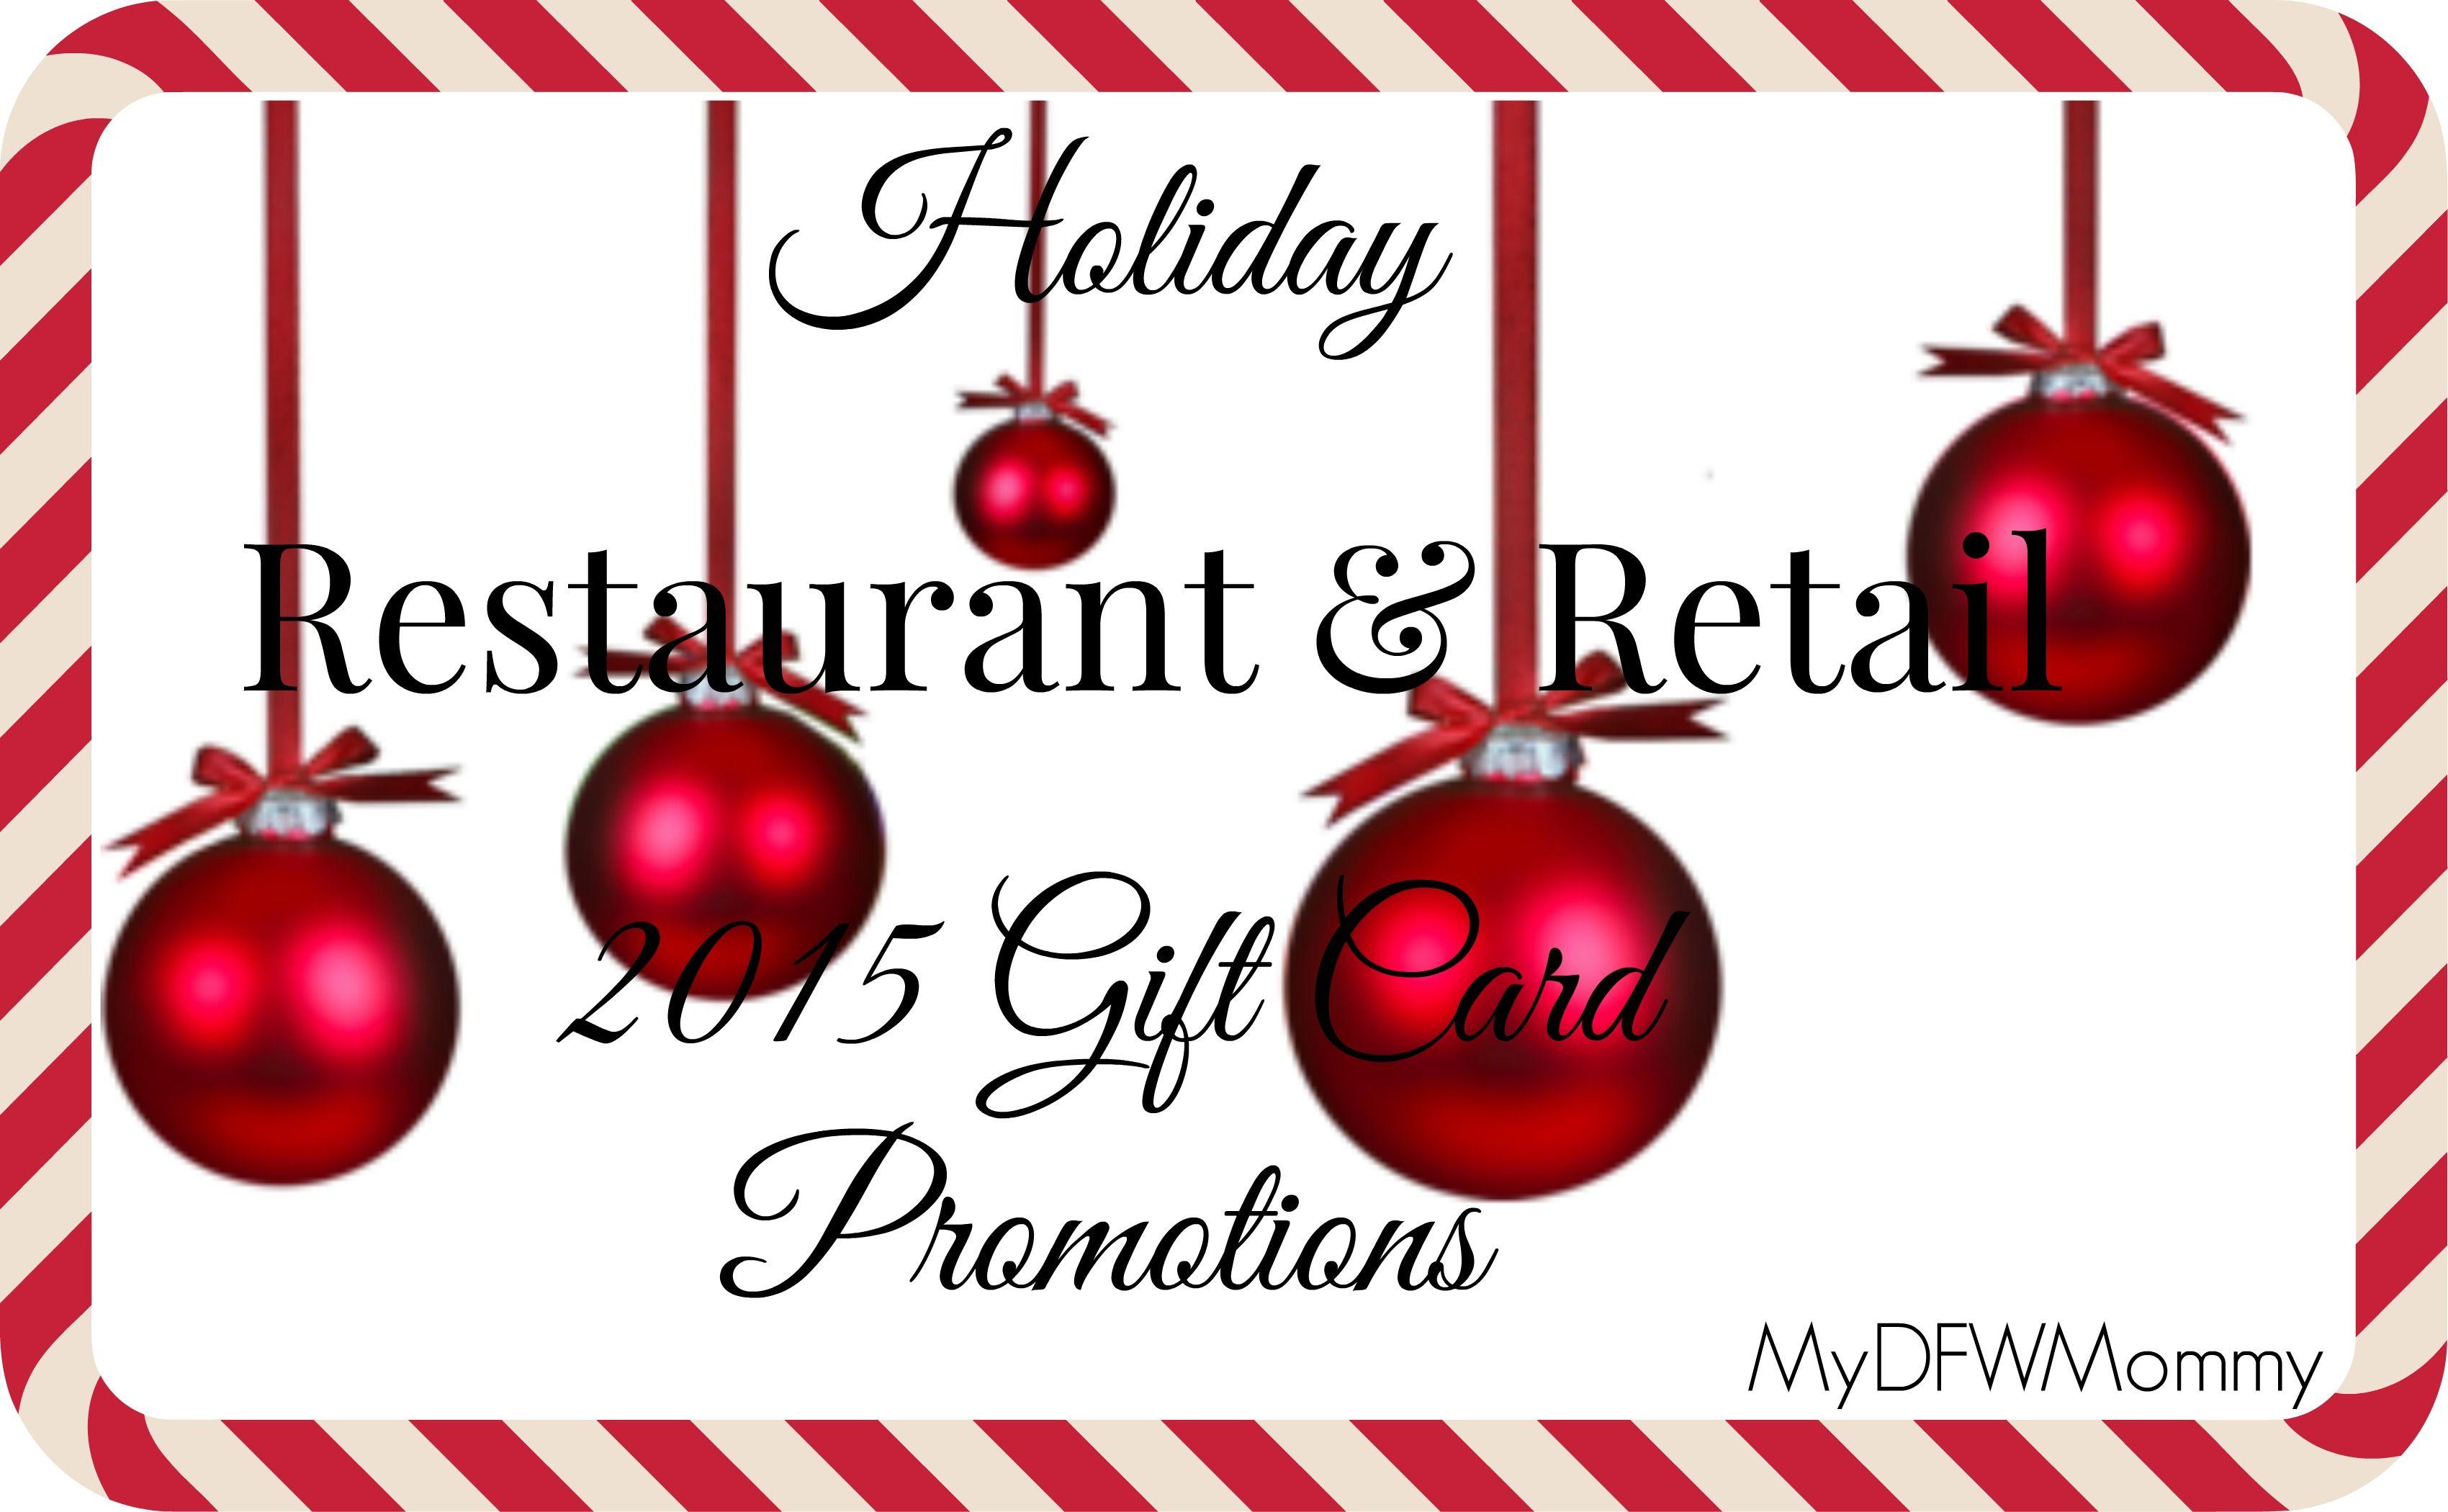 Restaurant & Retail Holiday Gift Card Deals | Gift card deals ...